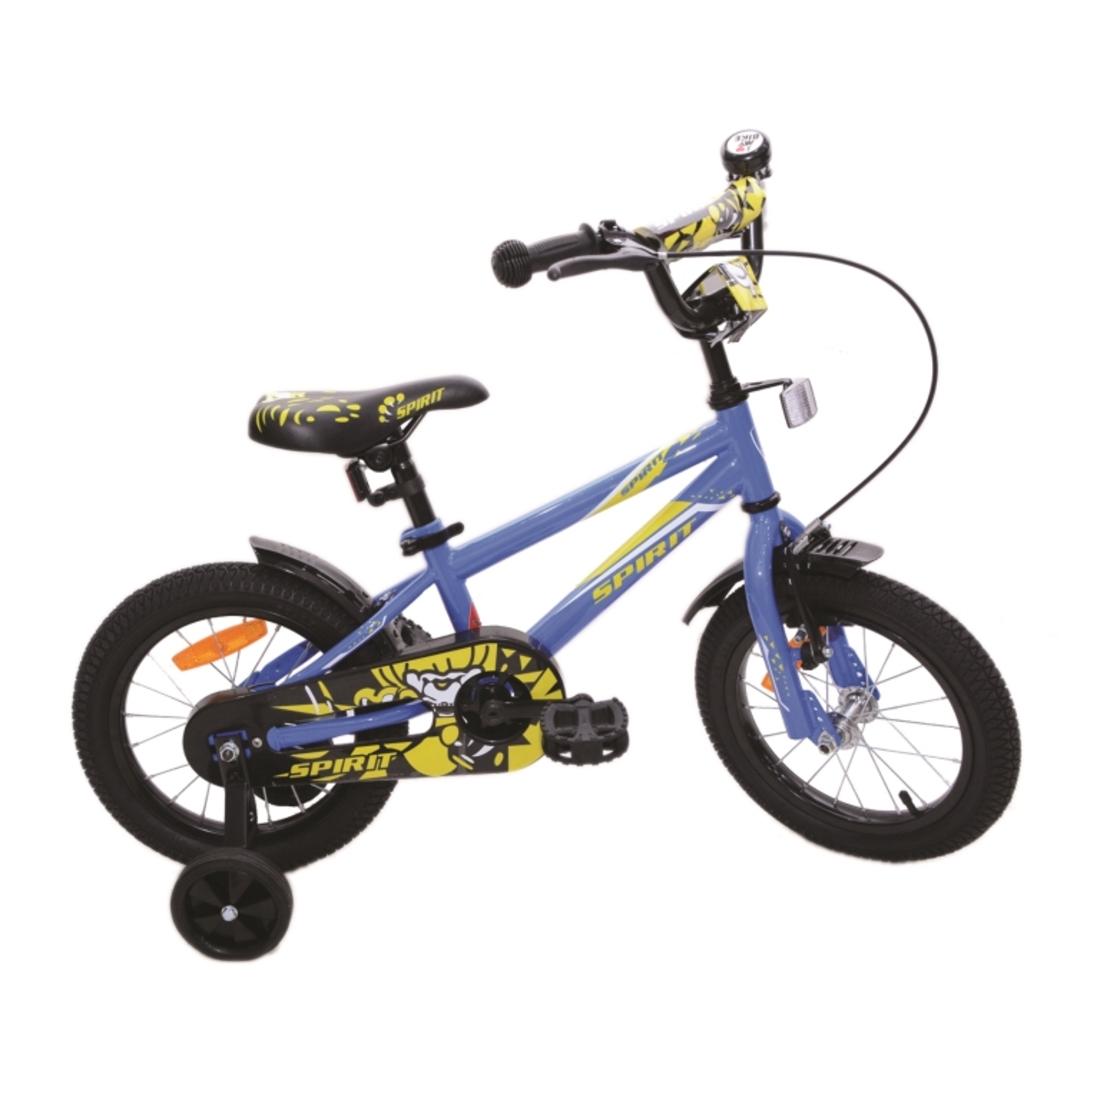 BMX SPIRIT 12